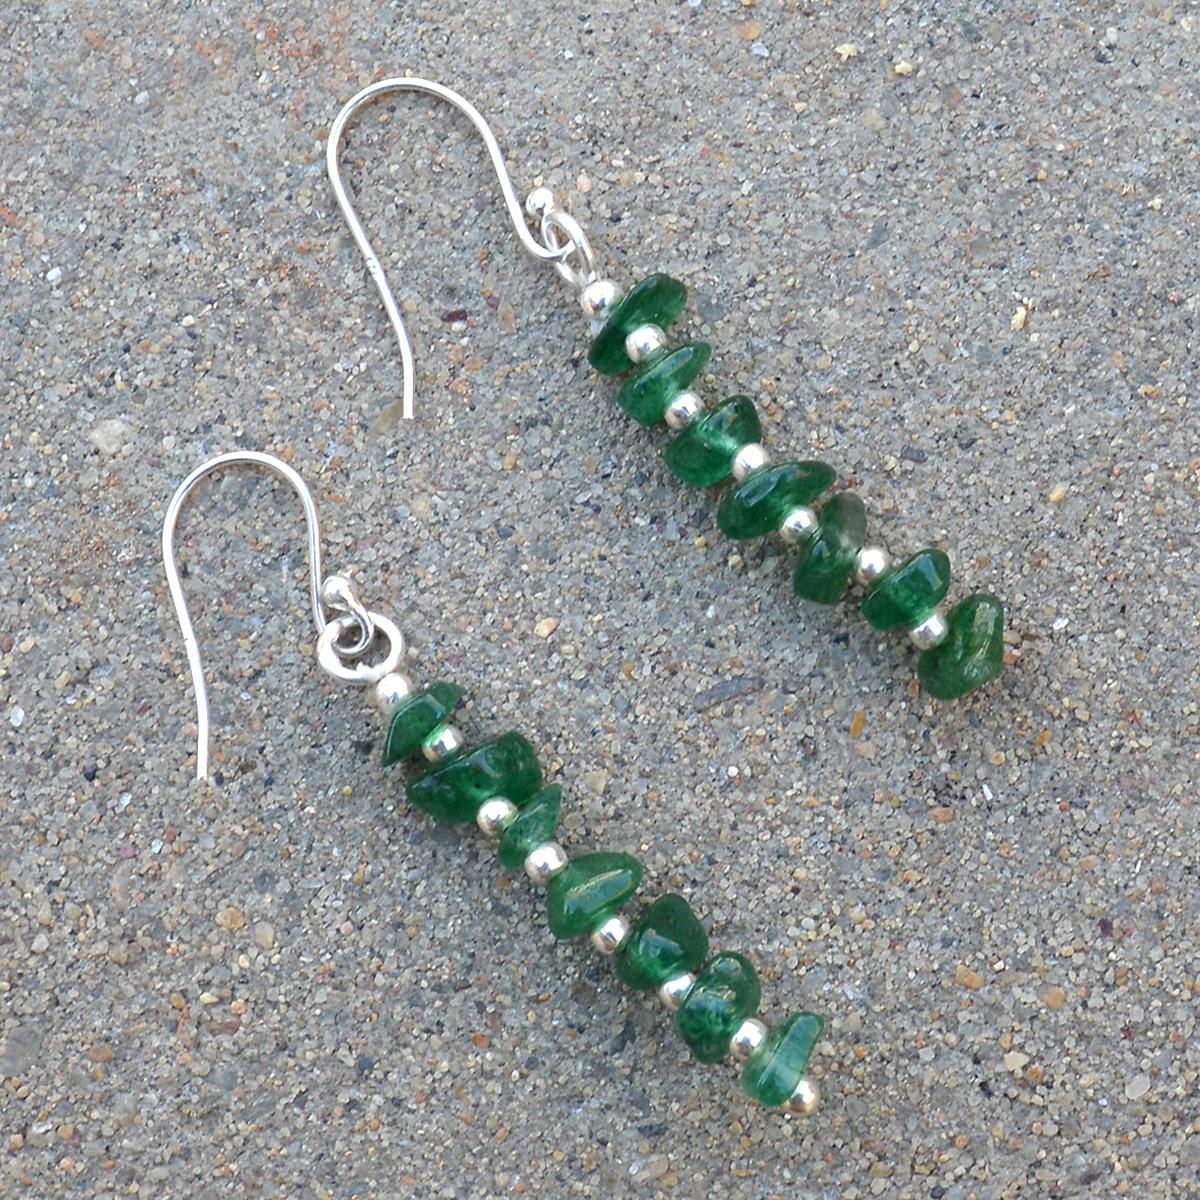 Green Aventurine Gemstone Handmade Jewelry Manufacturer 925 Sterling Silver  Jaipur Rajasthan India Dangle Fish Hook Earring